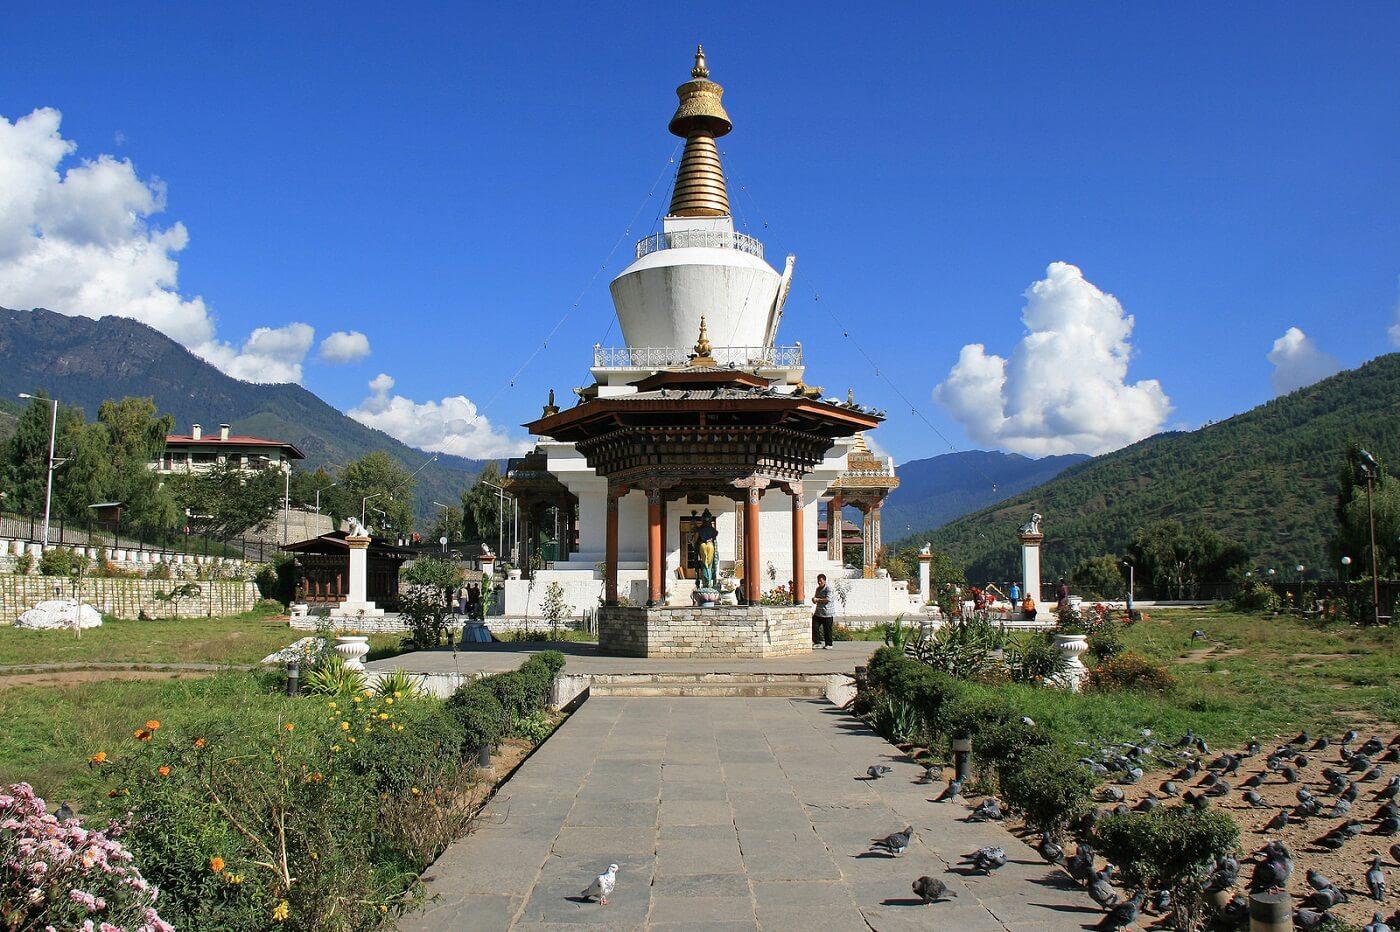 National Memorial Chorten, Thimphu